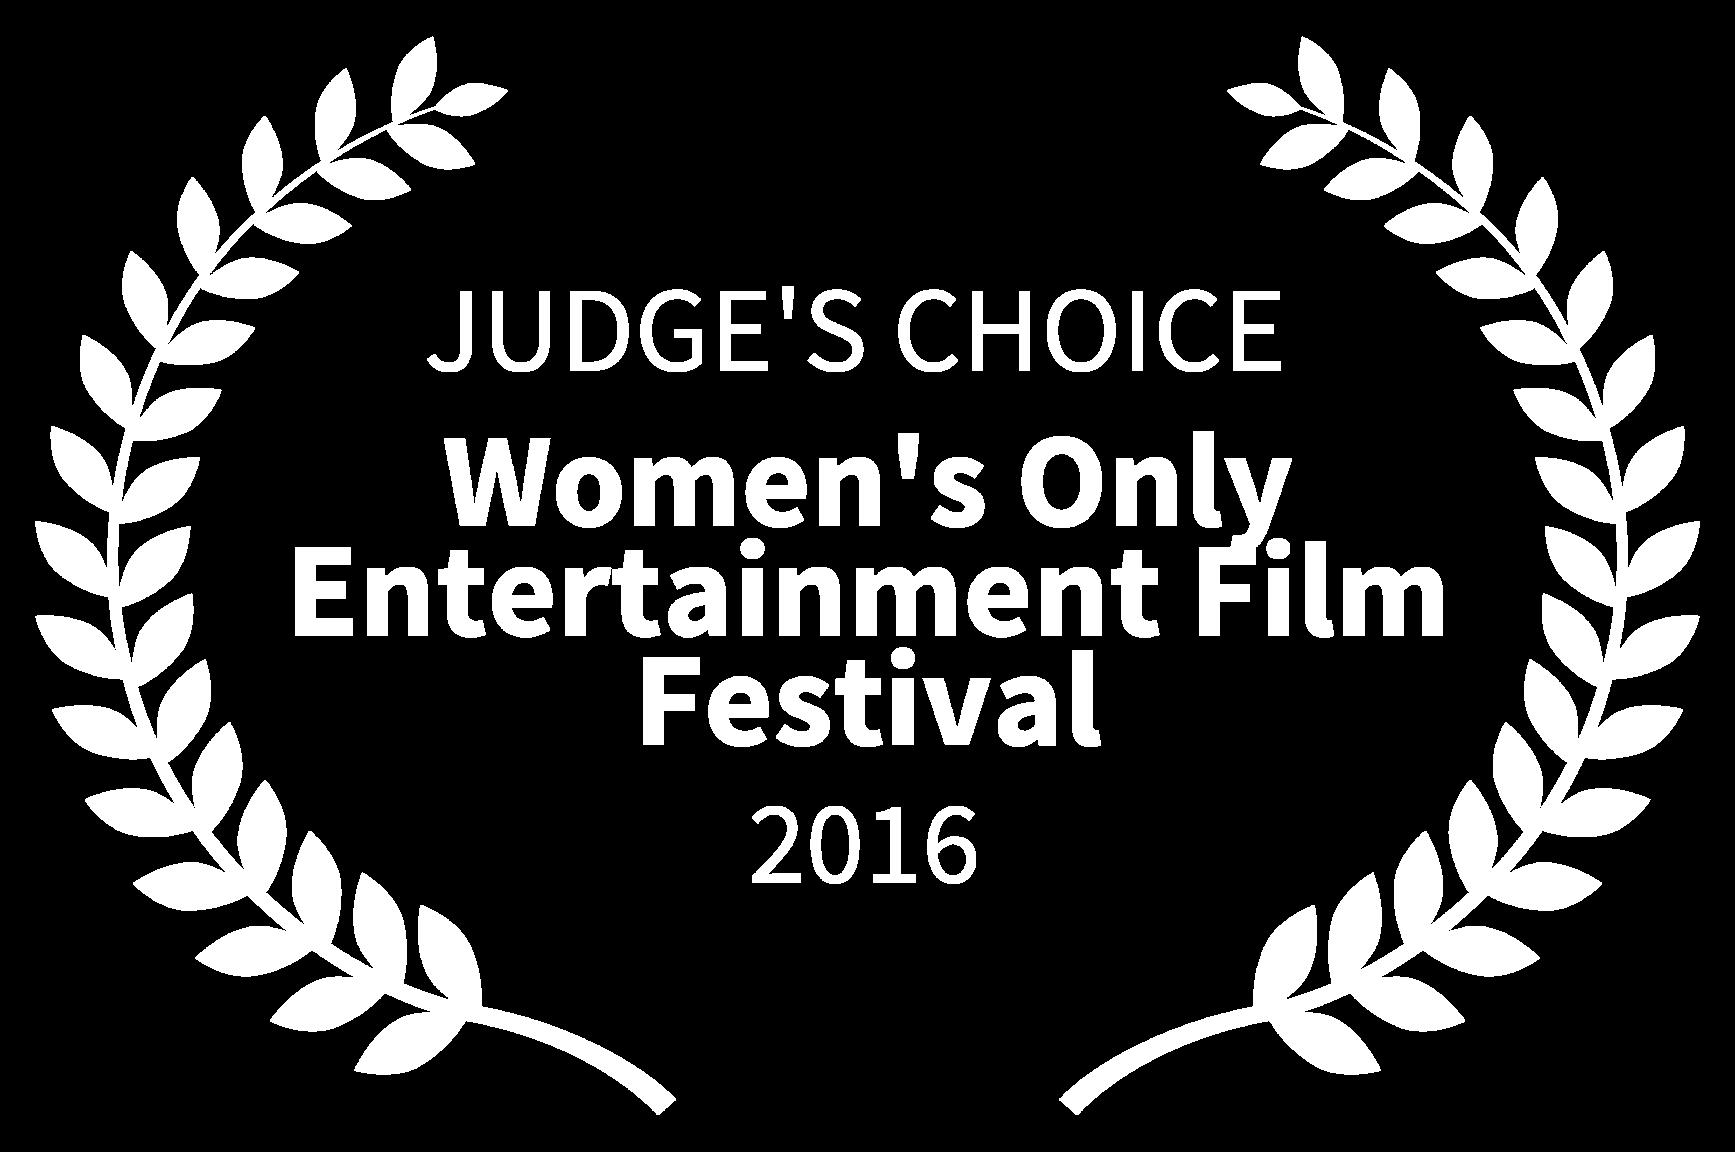 JUDGES CHOICE  - Womens Only Entertainment Film Festival - 2016